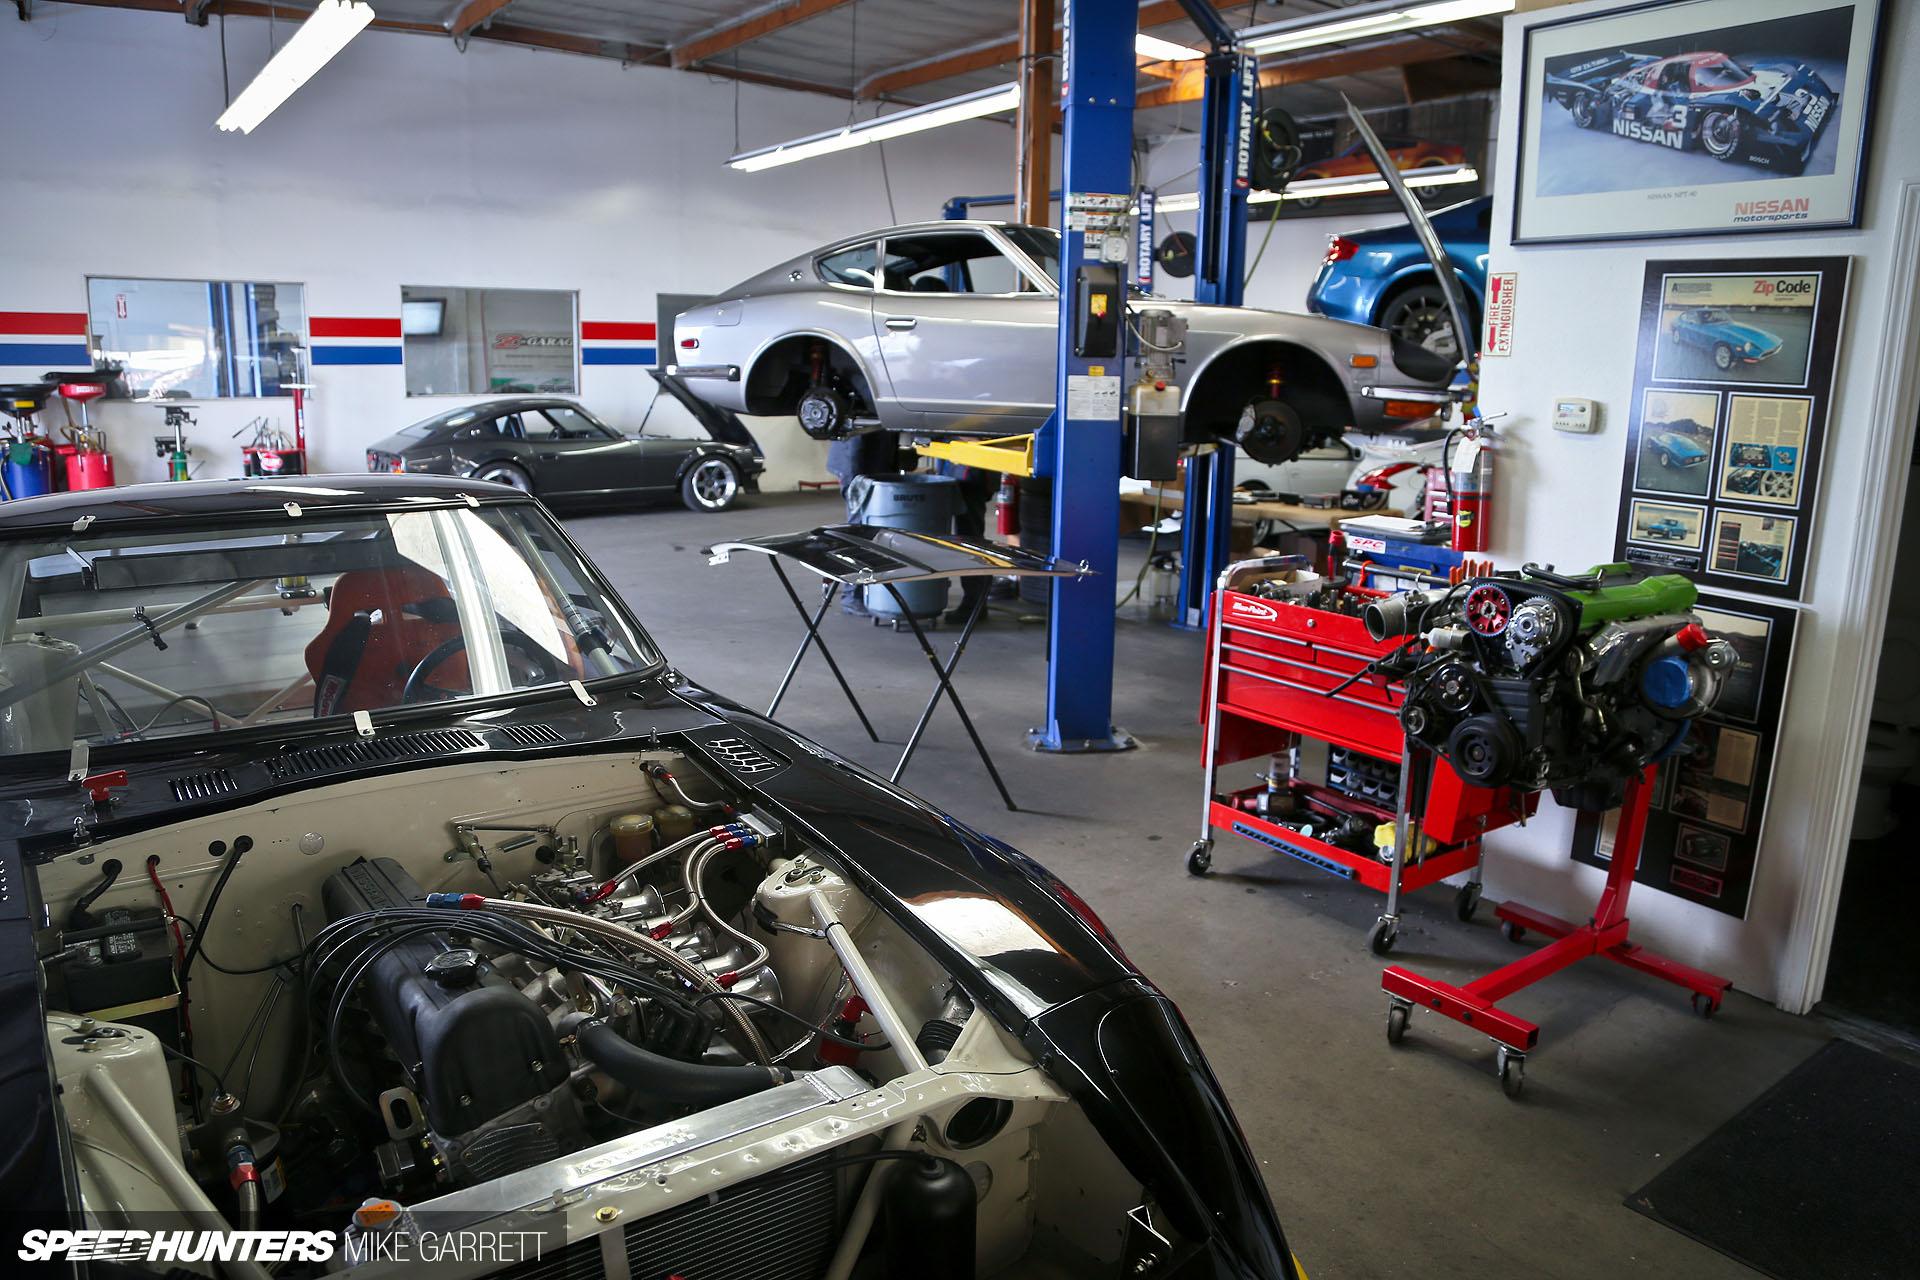 Z Car Garage: Where Datsun Geeks Rule - Speedhunters